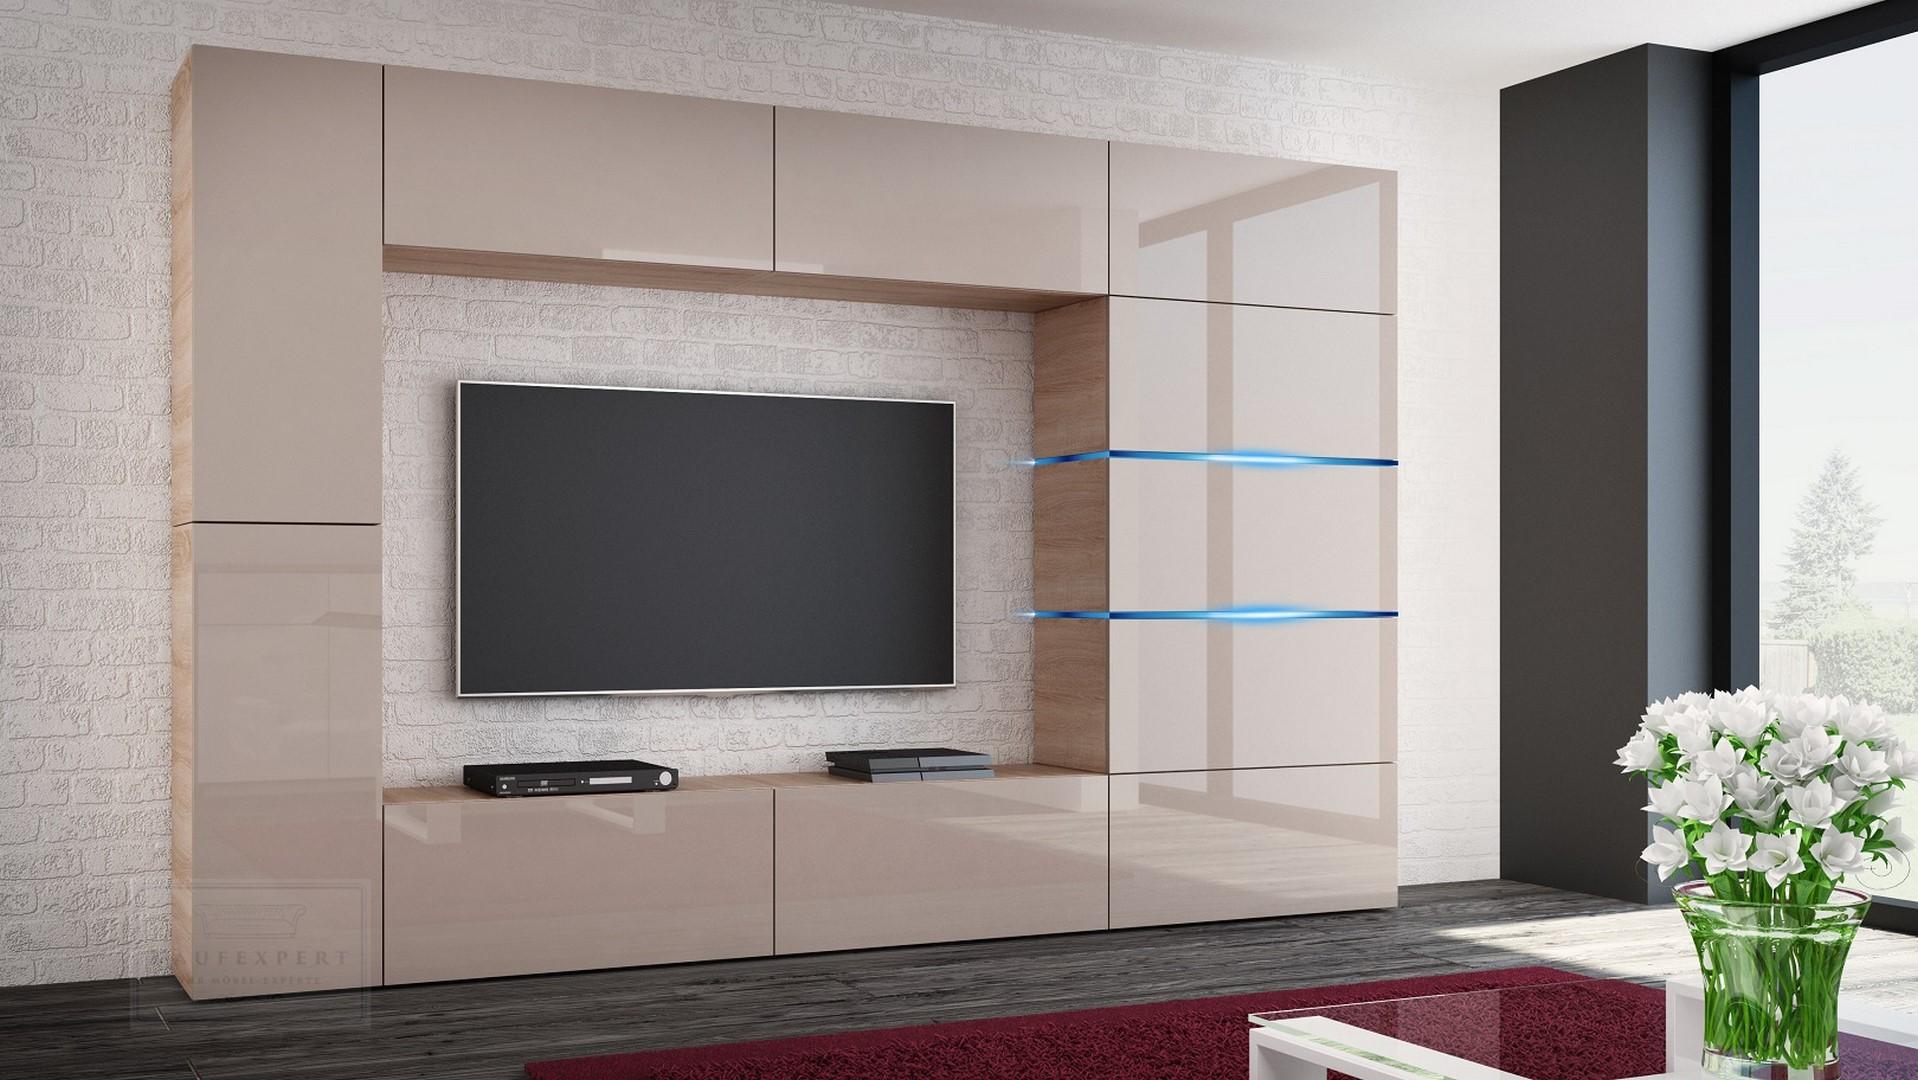 Elegant Wohnwand Shadow Cappuccino Hochglanz/Sonoma 285 Cm Mediawand Anbauwand  Medienwand Design Modern Led Beleuchtung MDF